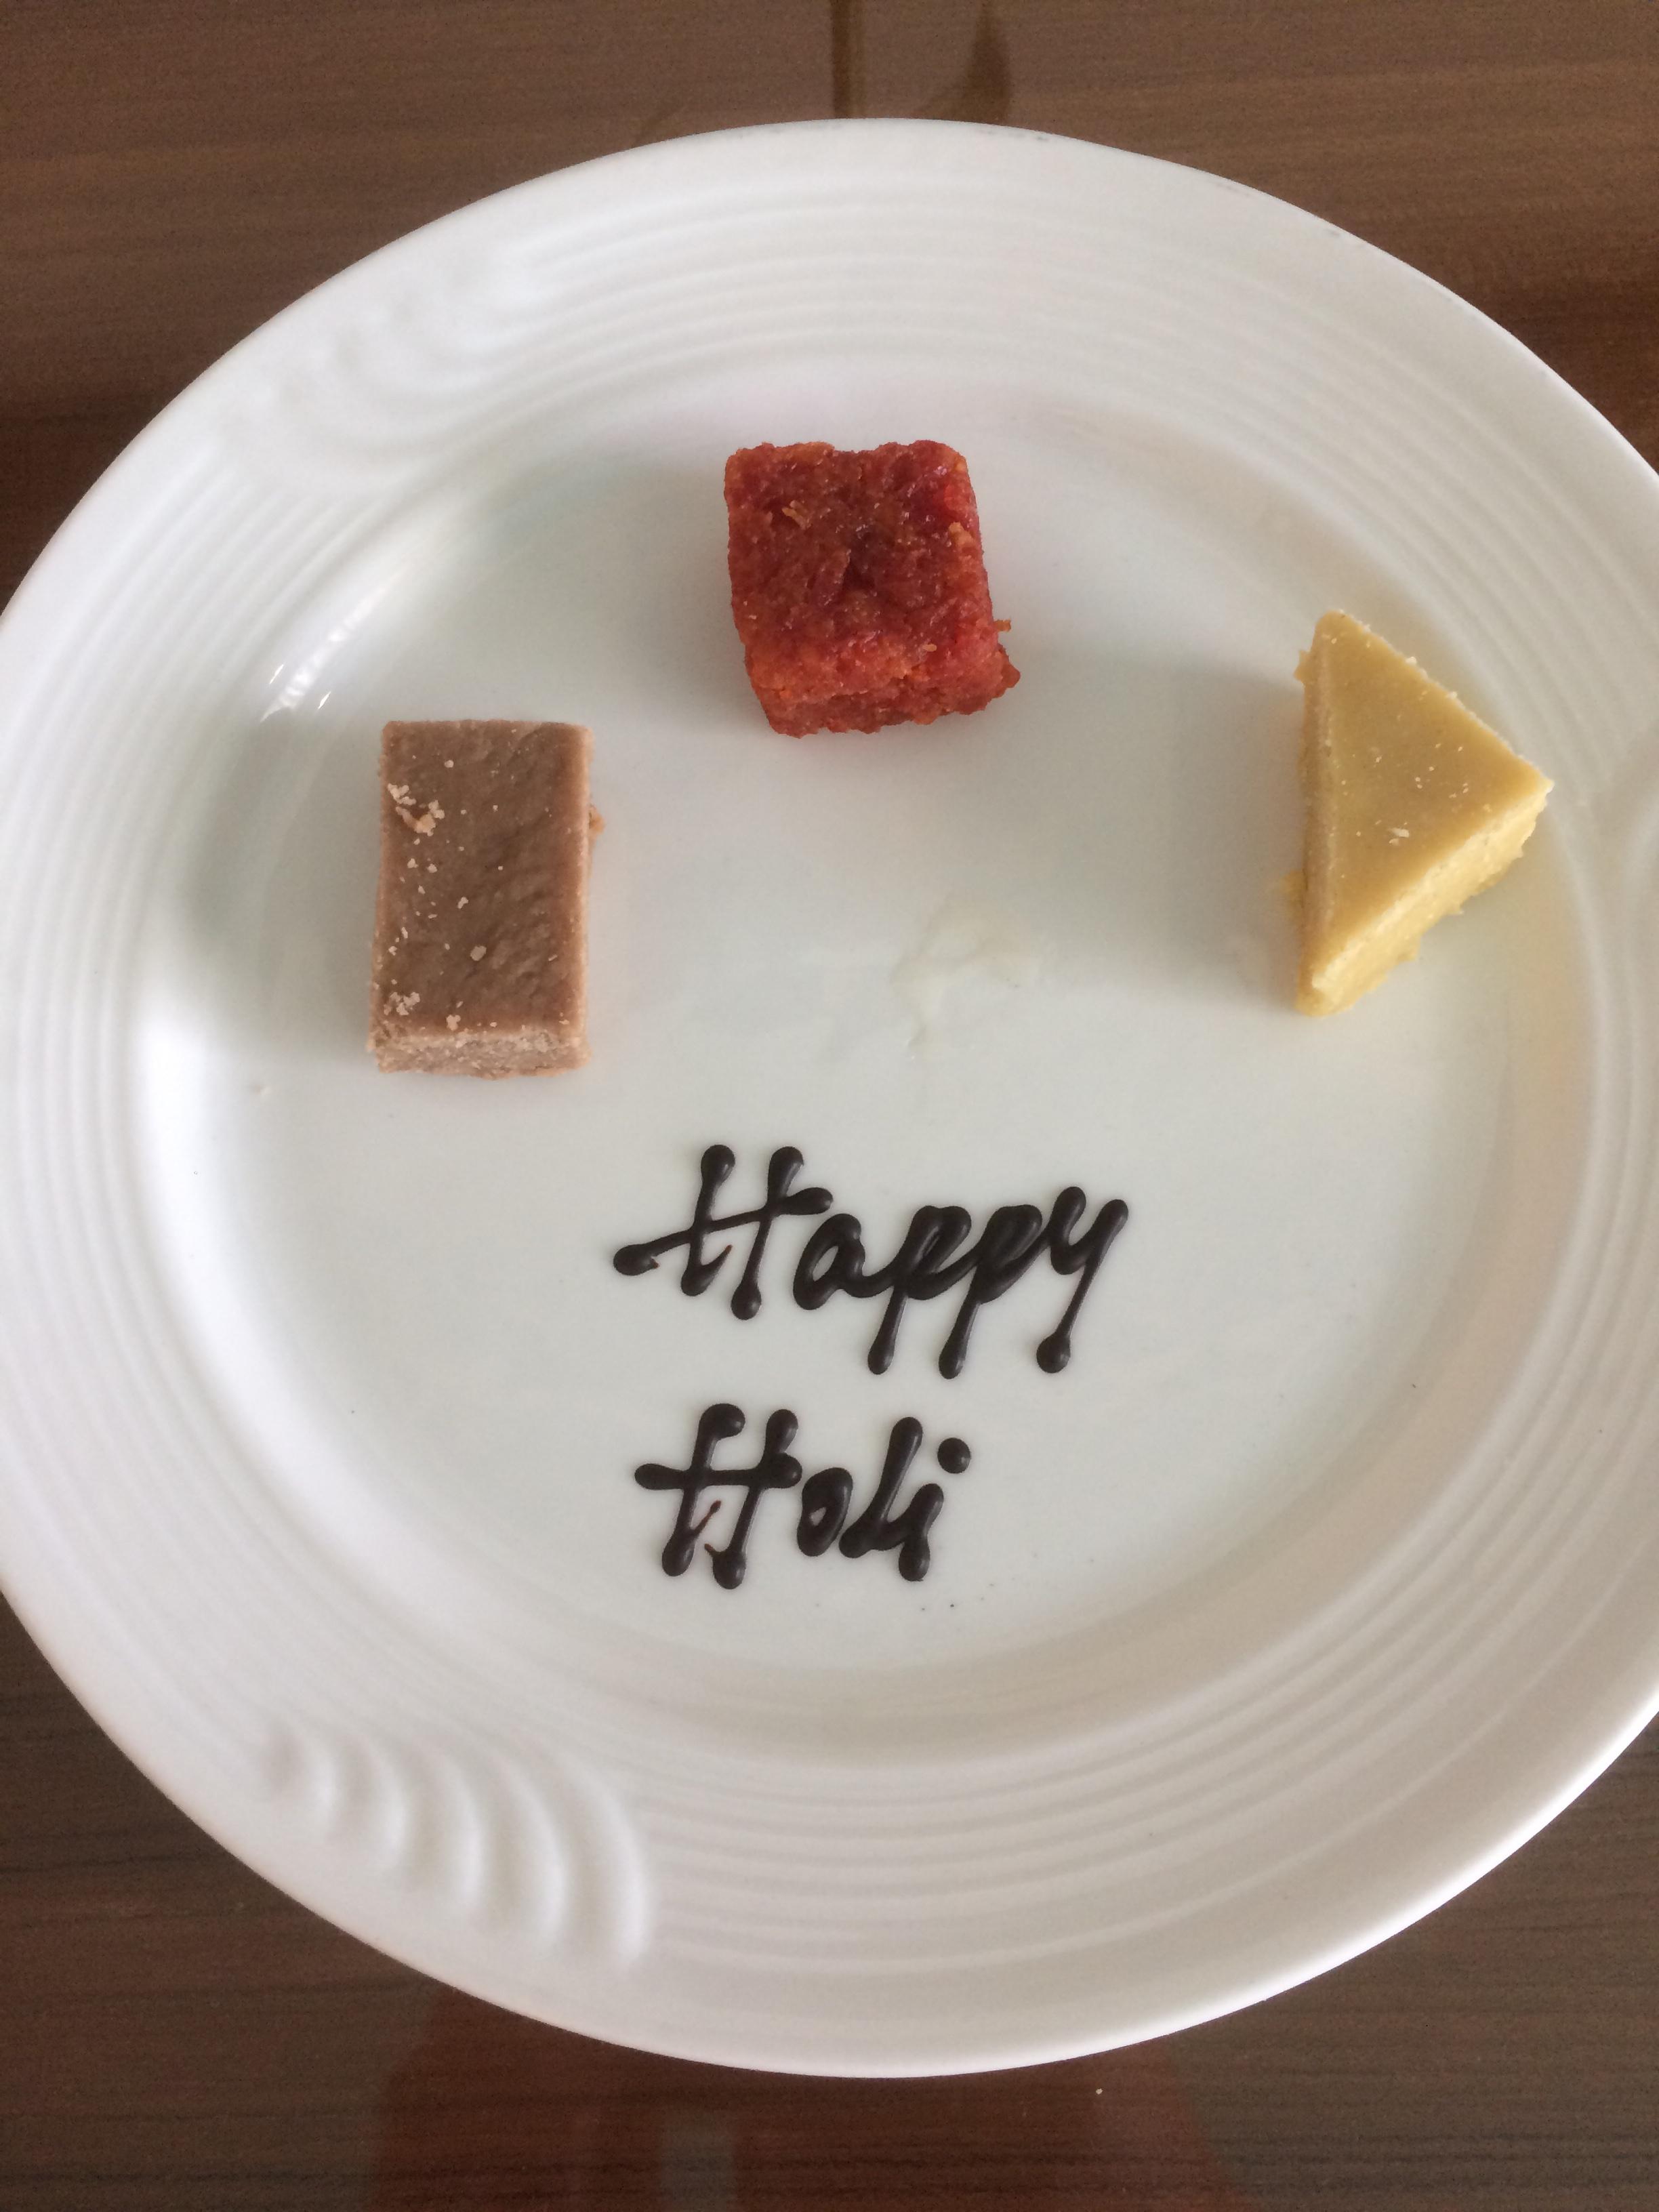 Happy Holi dessert place